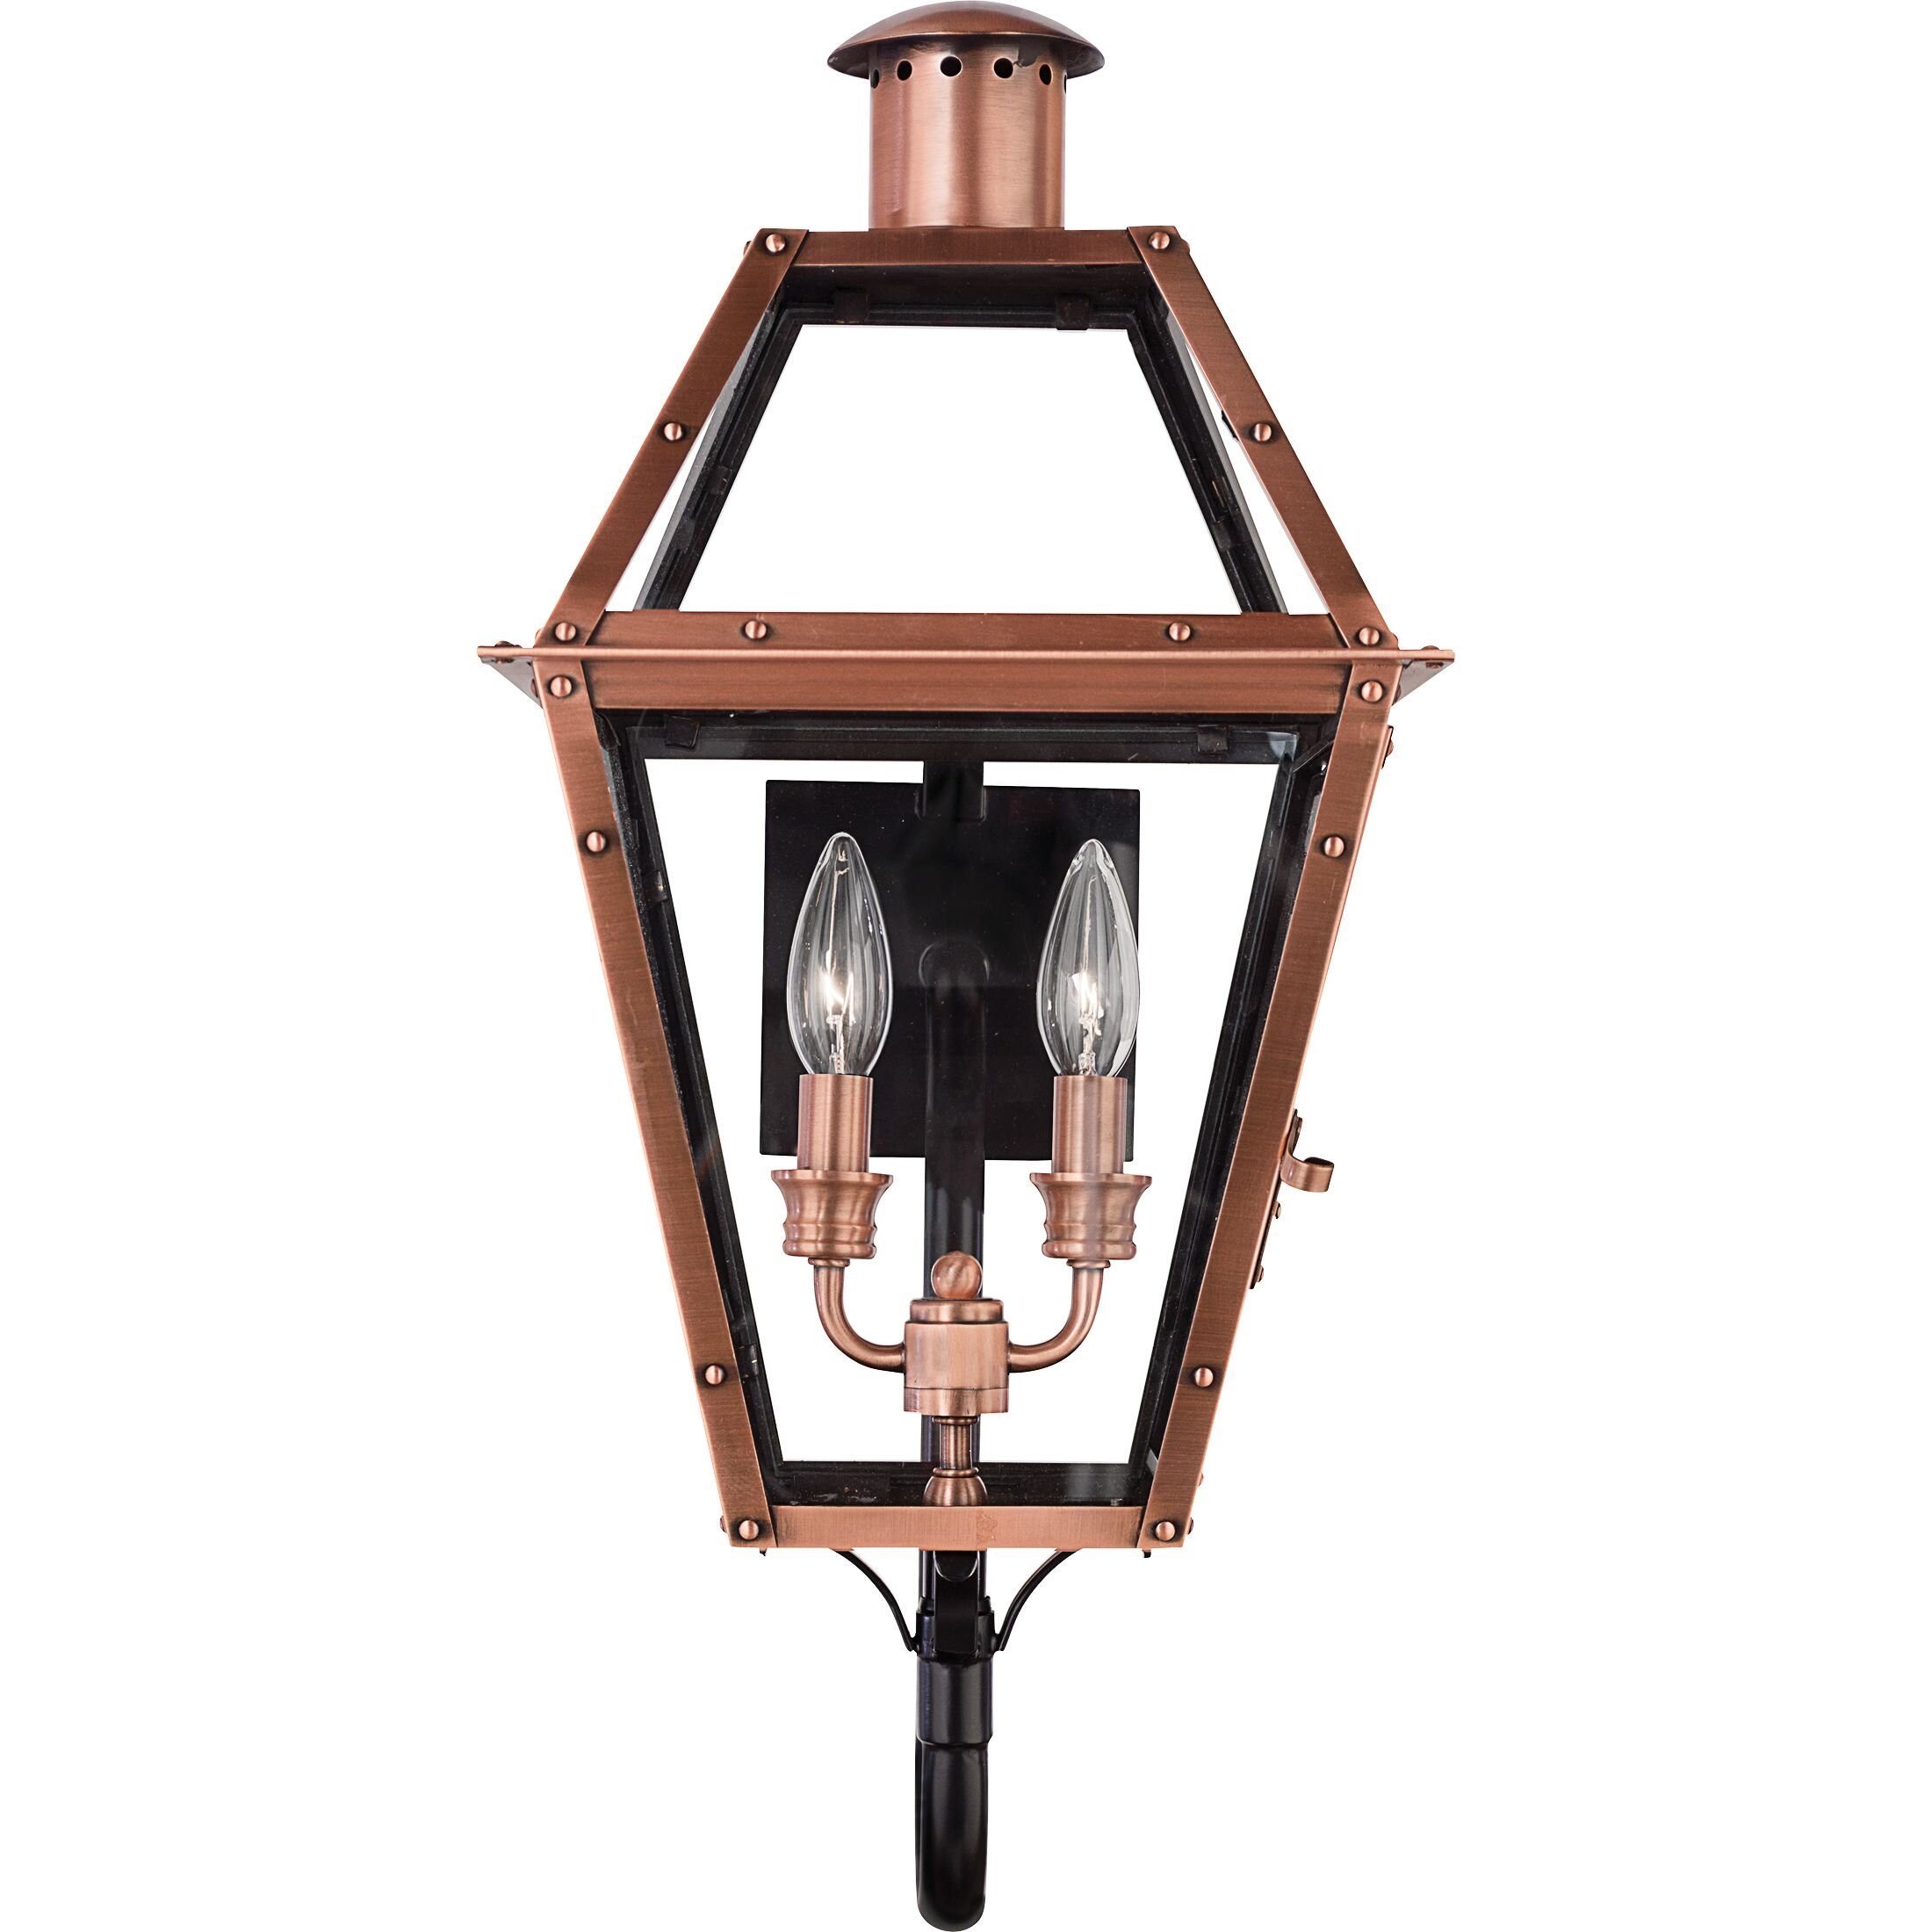 2 Light Copper Outdoor Wall Lighting You Ll Love In 2021 Wayfair